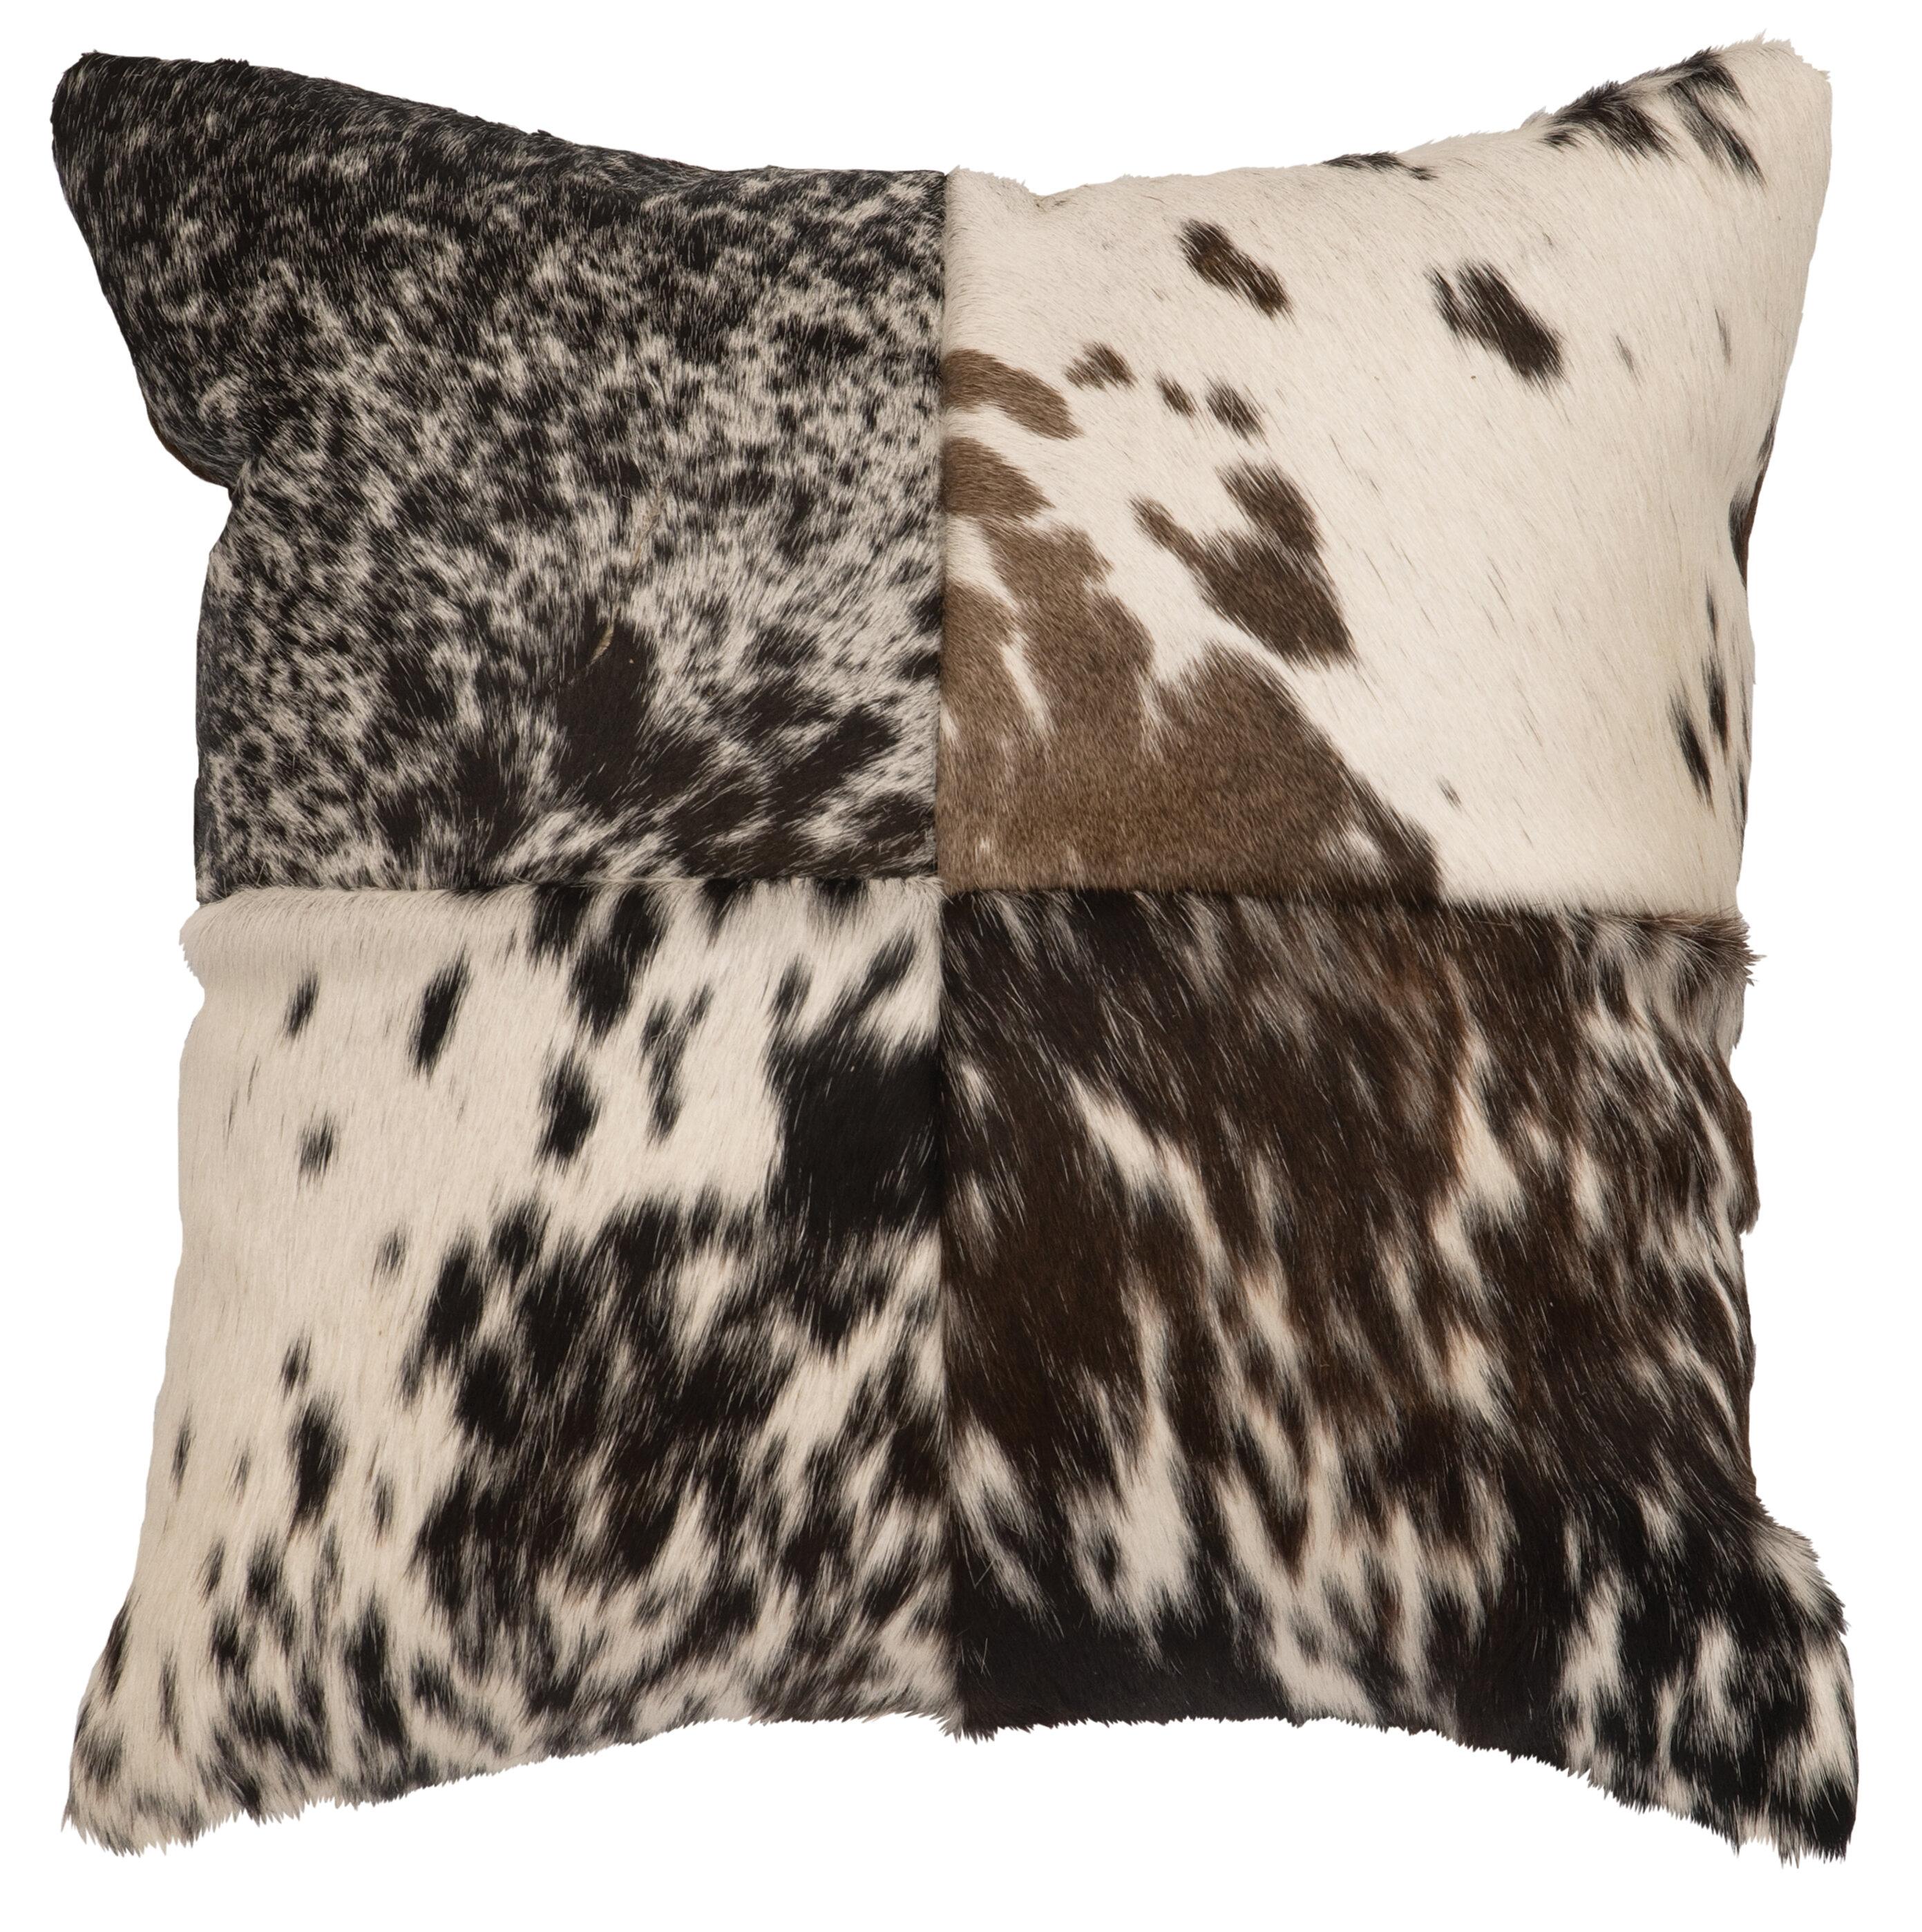 Bloomsbury Market Strathairn Leather Throw Pillow Reviews Wayfair